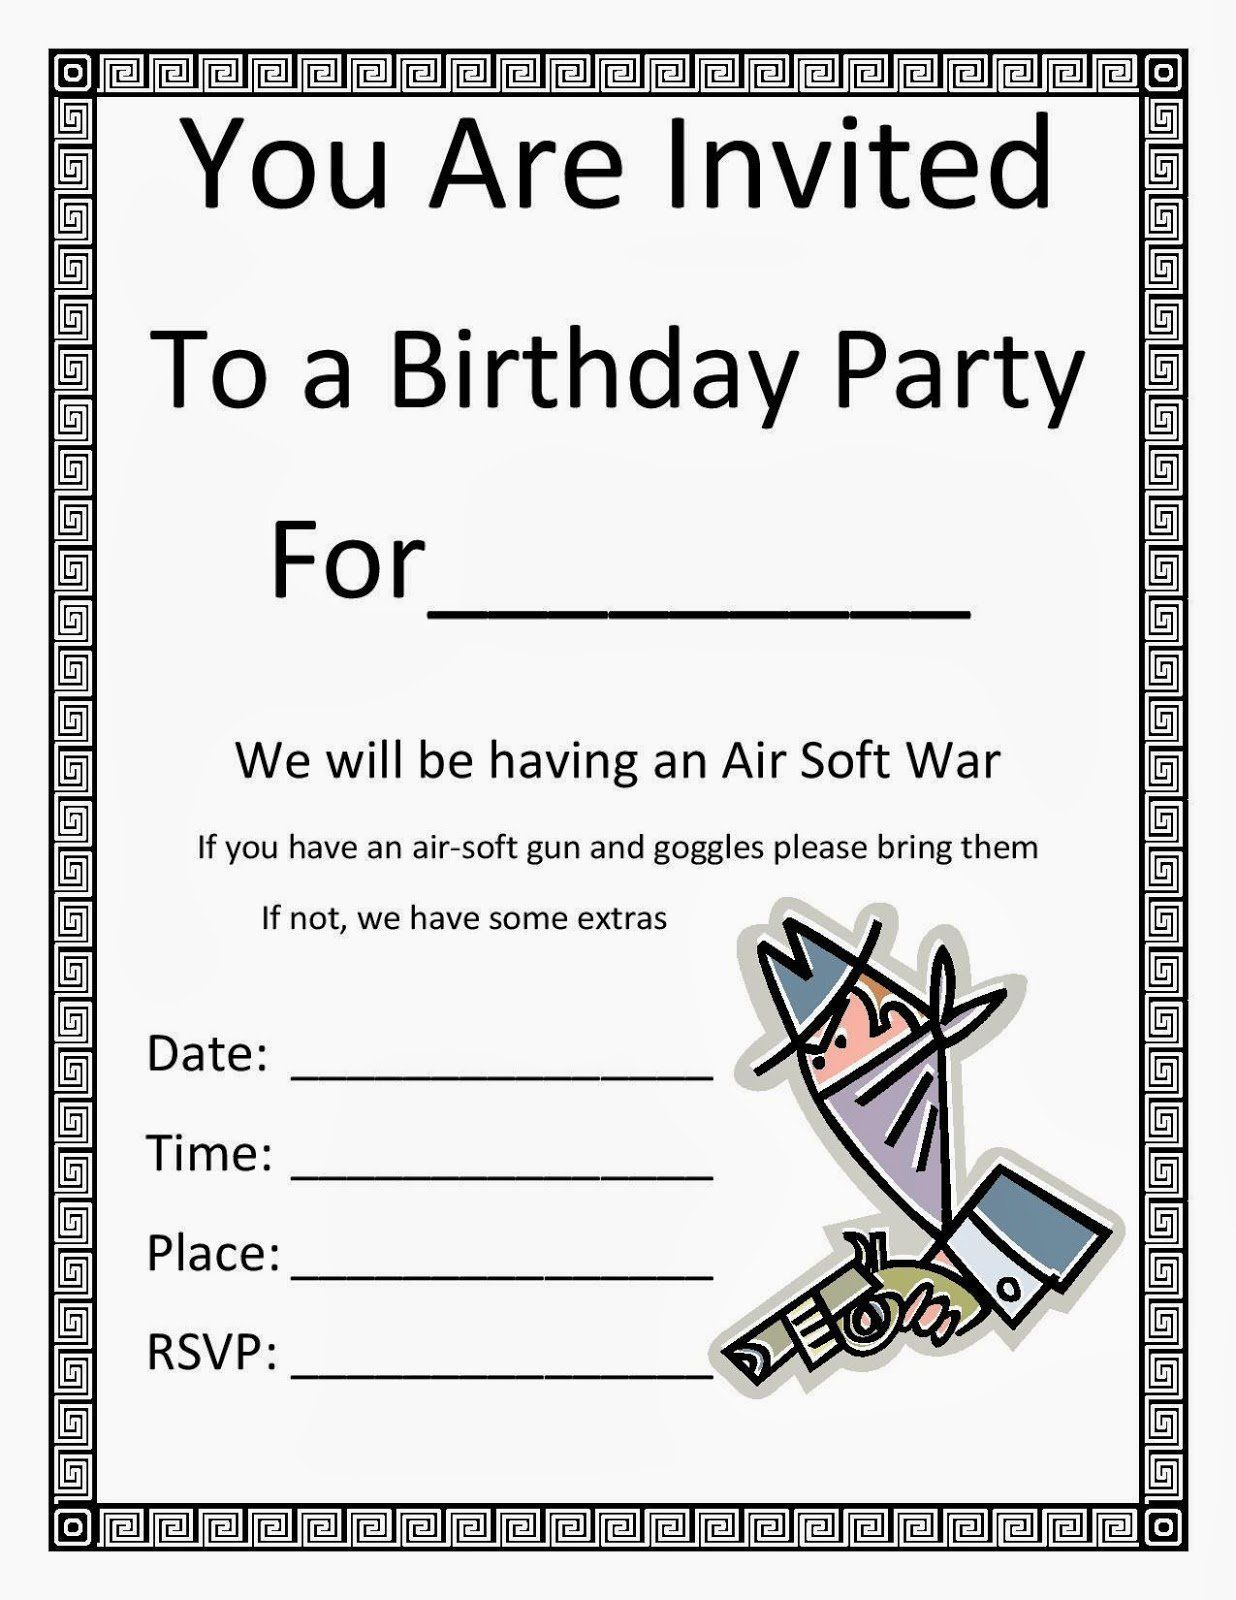 000 Imposing Party Invitation Template Word Idea  Dinner Summer Wording Sample Unicorn BirthdayFull